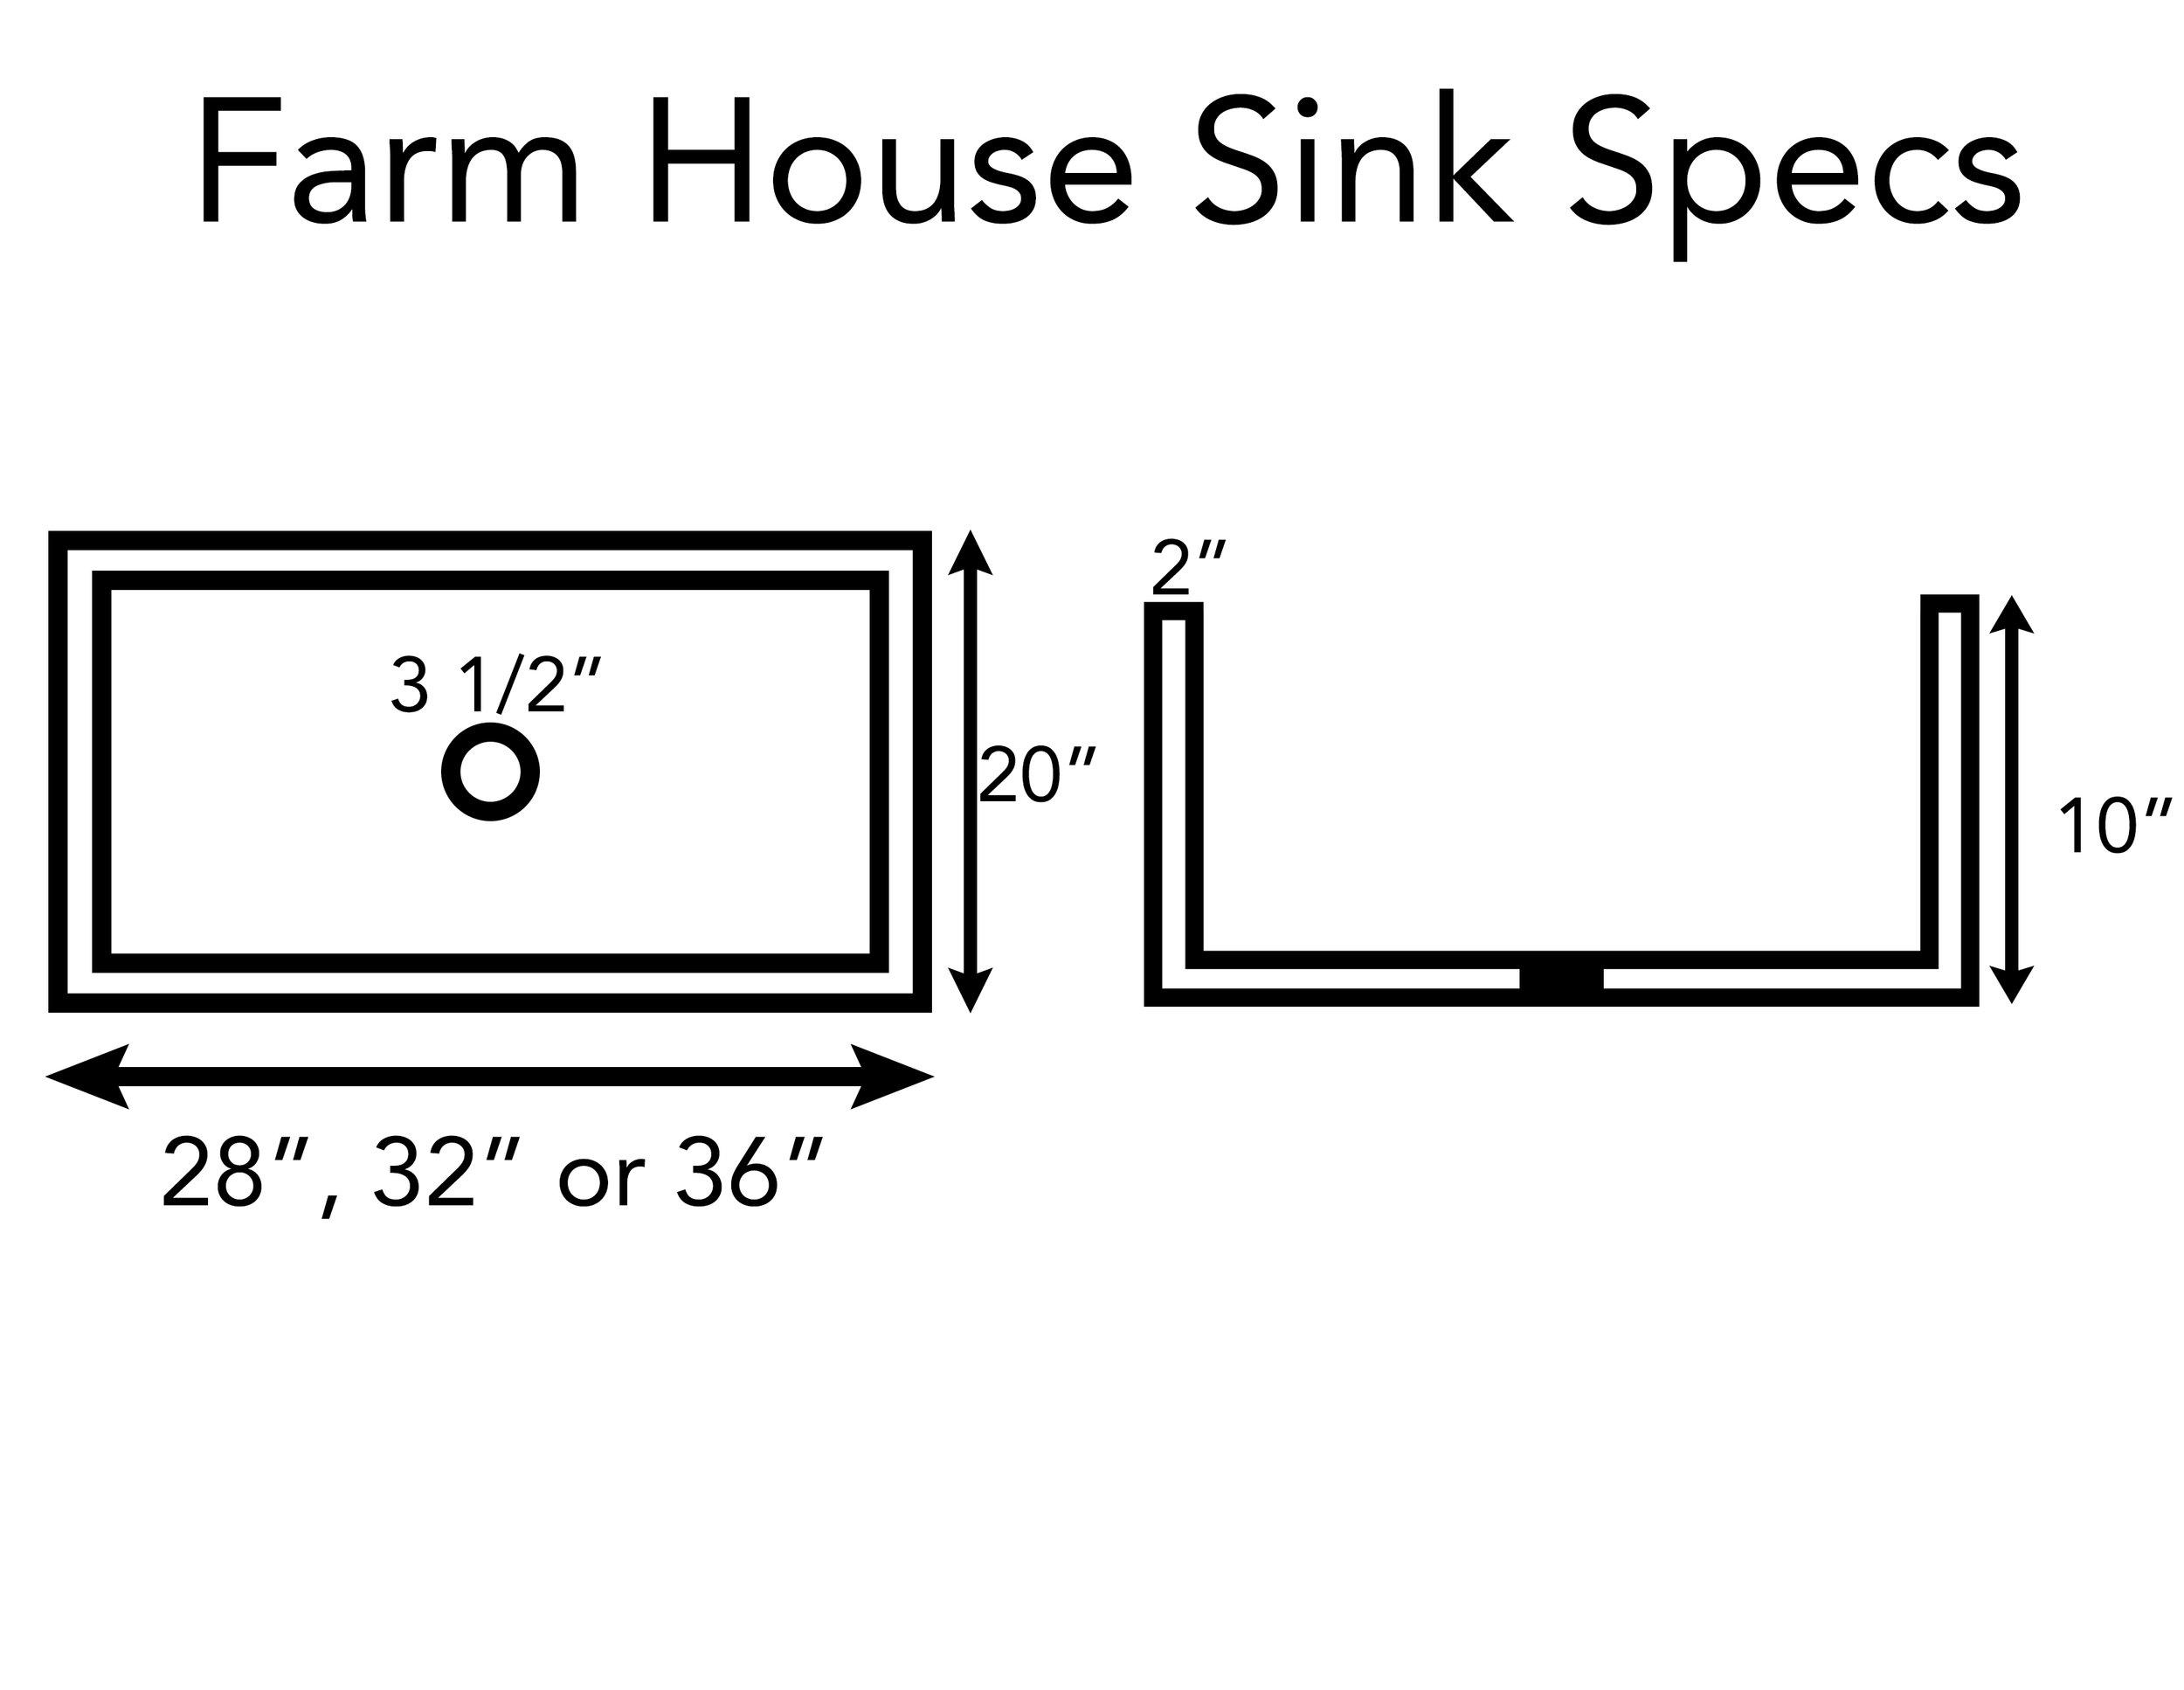 Farm House Sink Specs.jpg